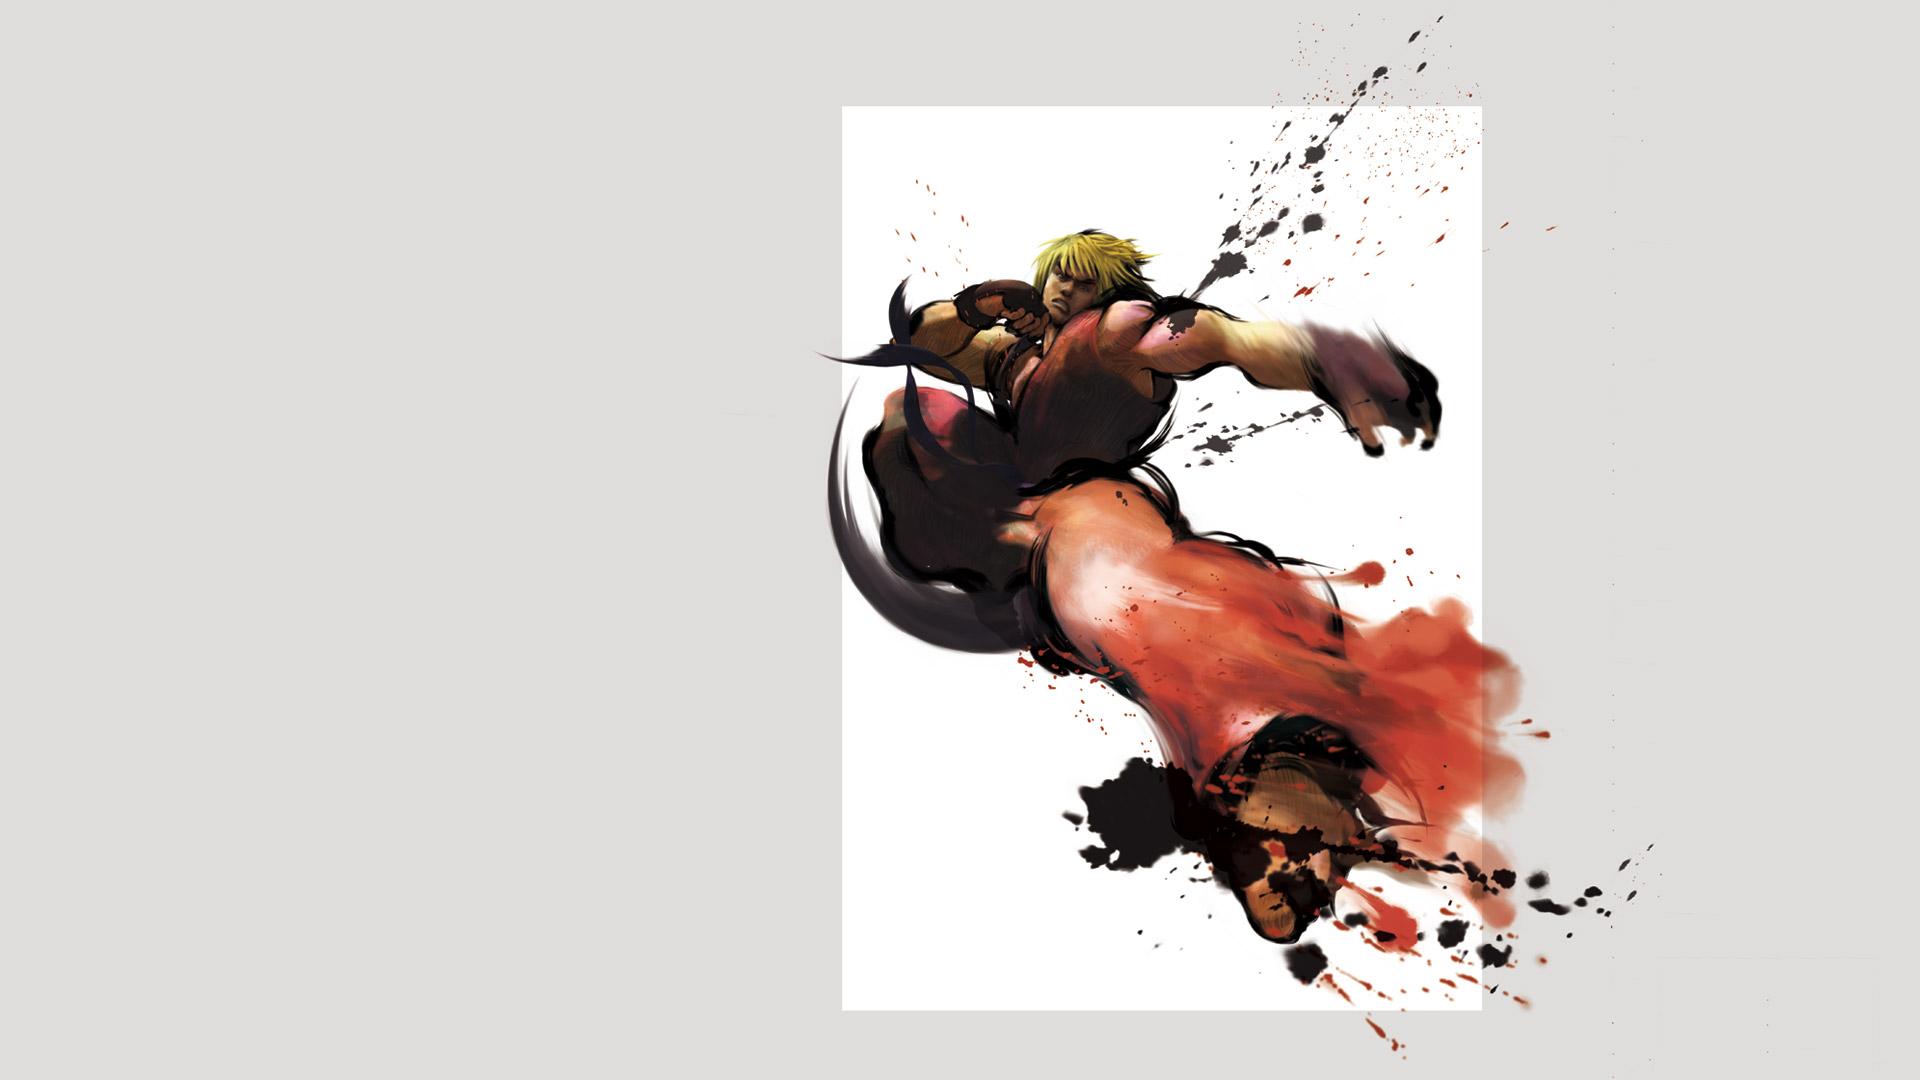 Street Fighter IV Wallpaper in 1920x1080